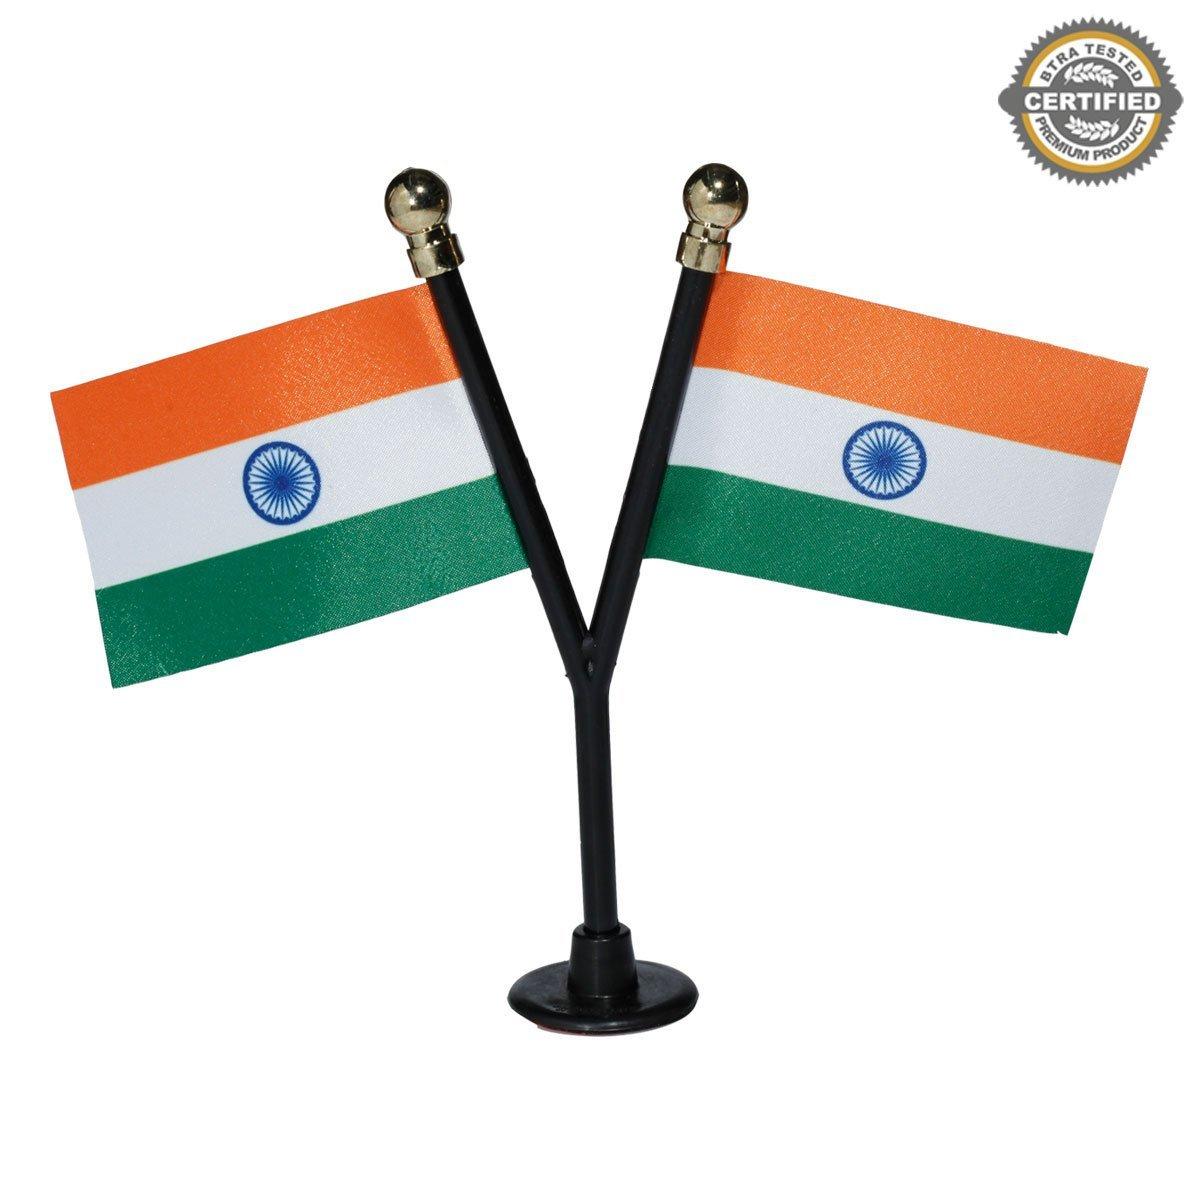 The Flag Shop Dual Indian Miniature Car Dashboard Flags With A Black Y-Staff & Plastic Nano Base